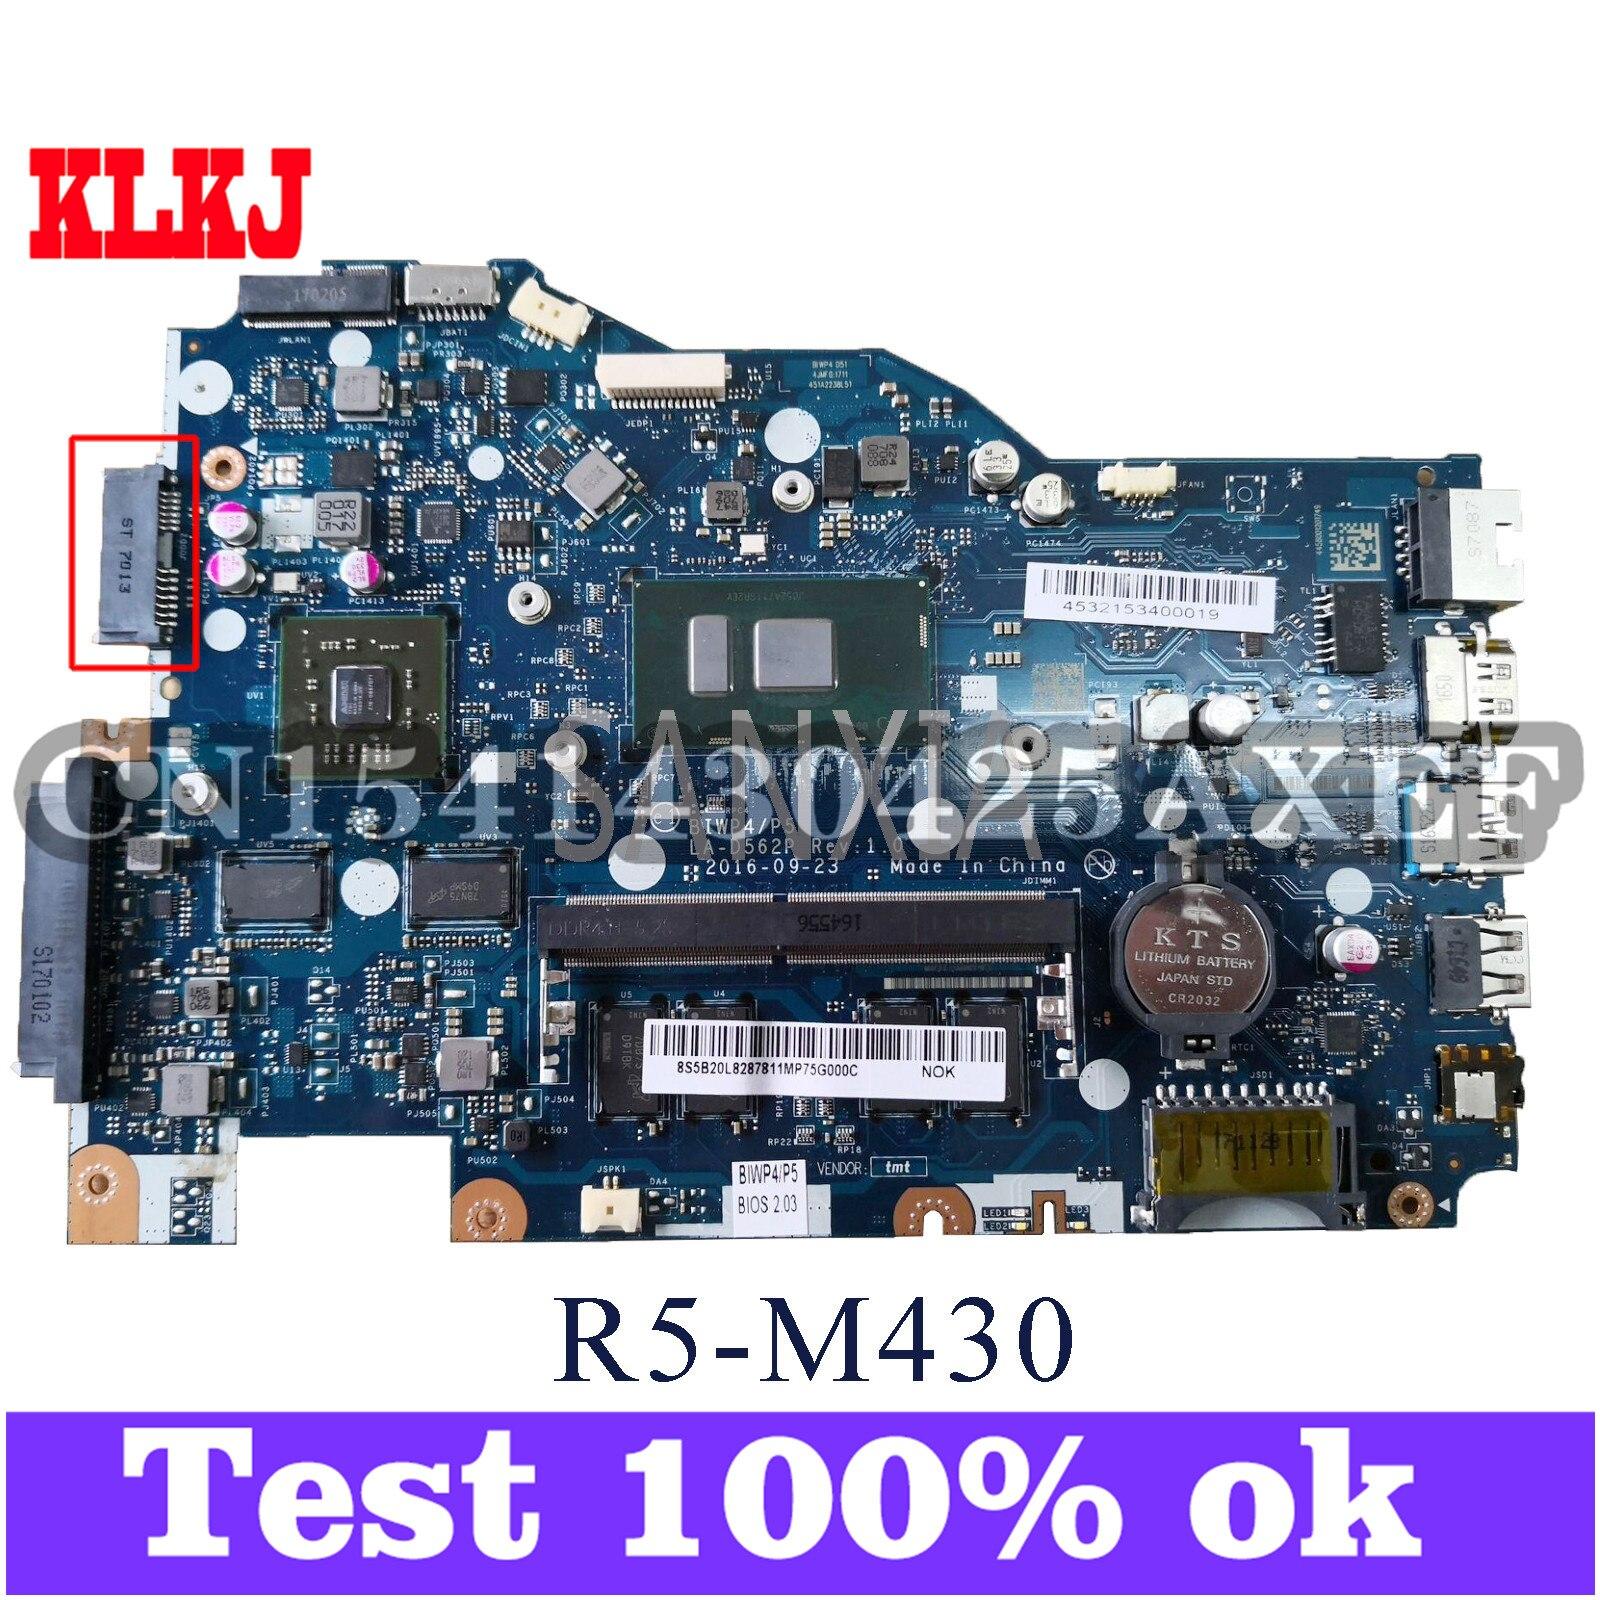 KLKJ LA-D562P Laotop اللوحة لينوفو Ideapad 110-14ISK الأصلي اللوحة الرئيسية 4G-RAM I5-6200U R5-M430